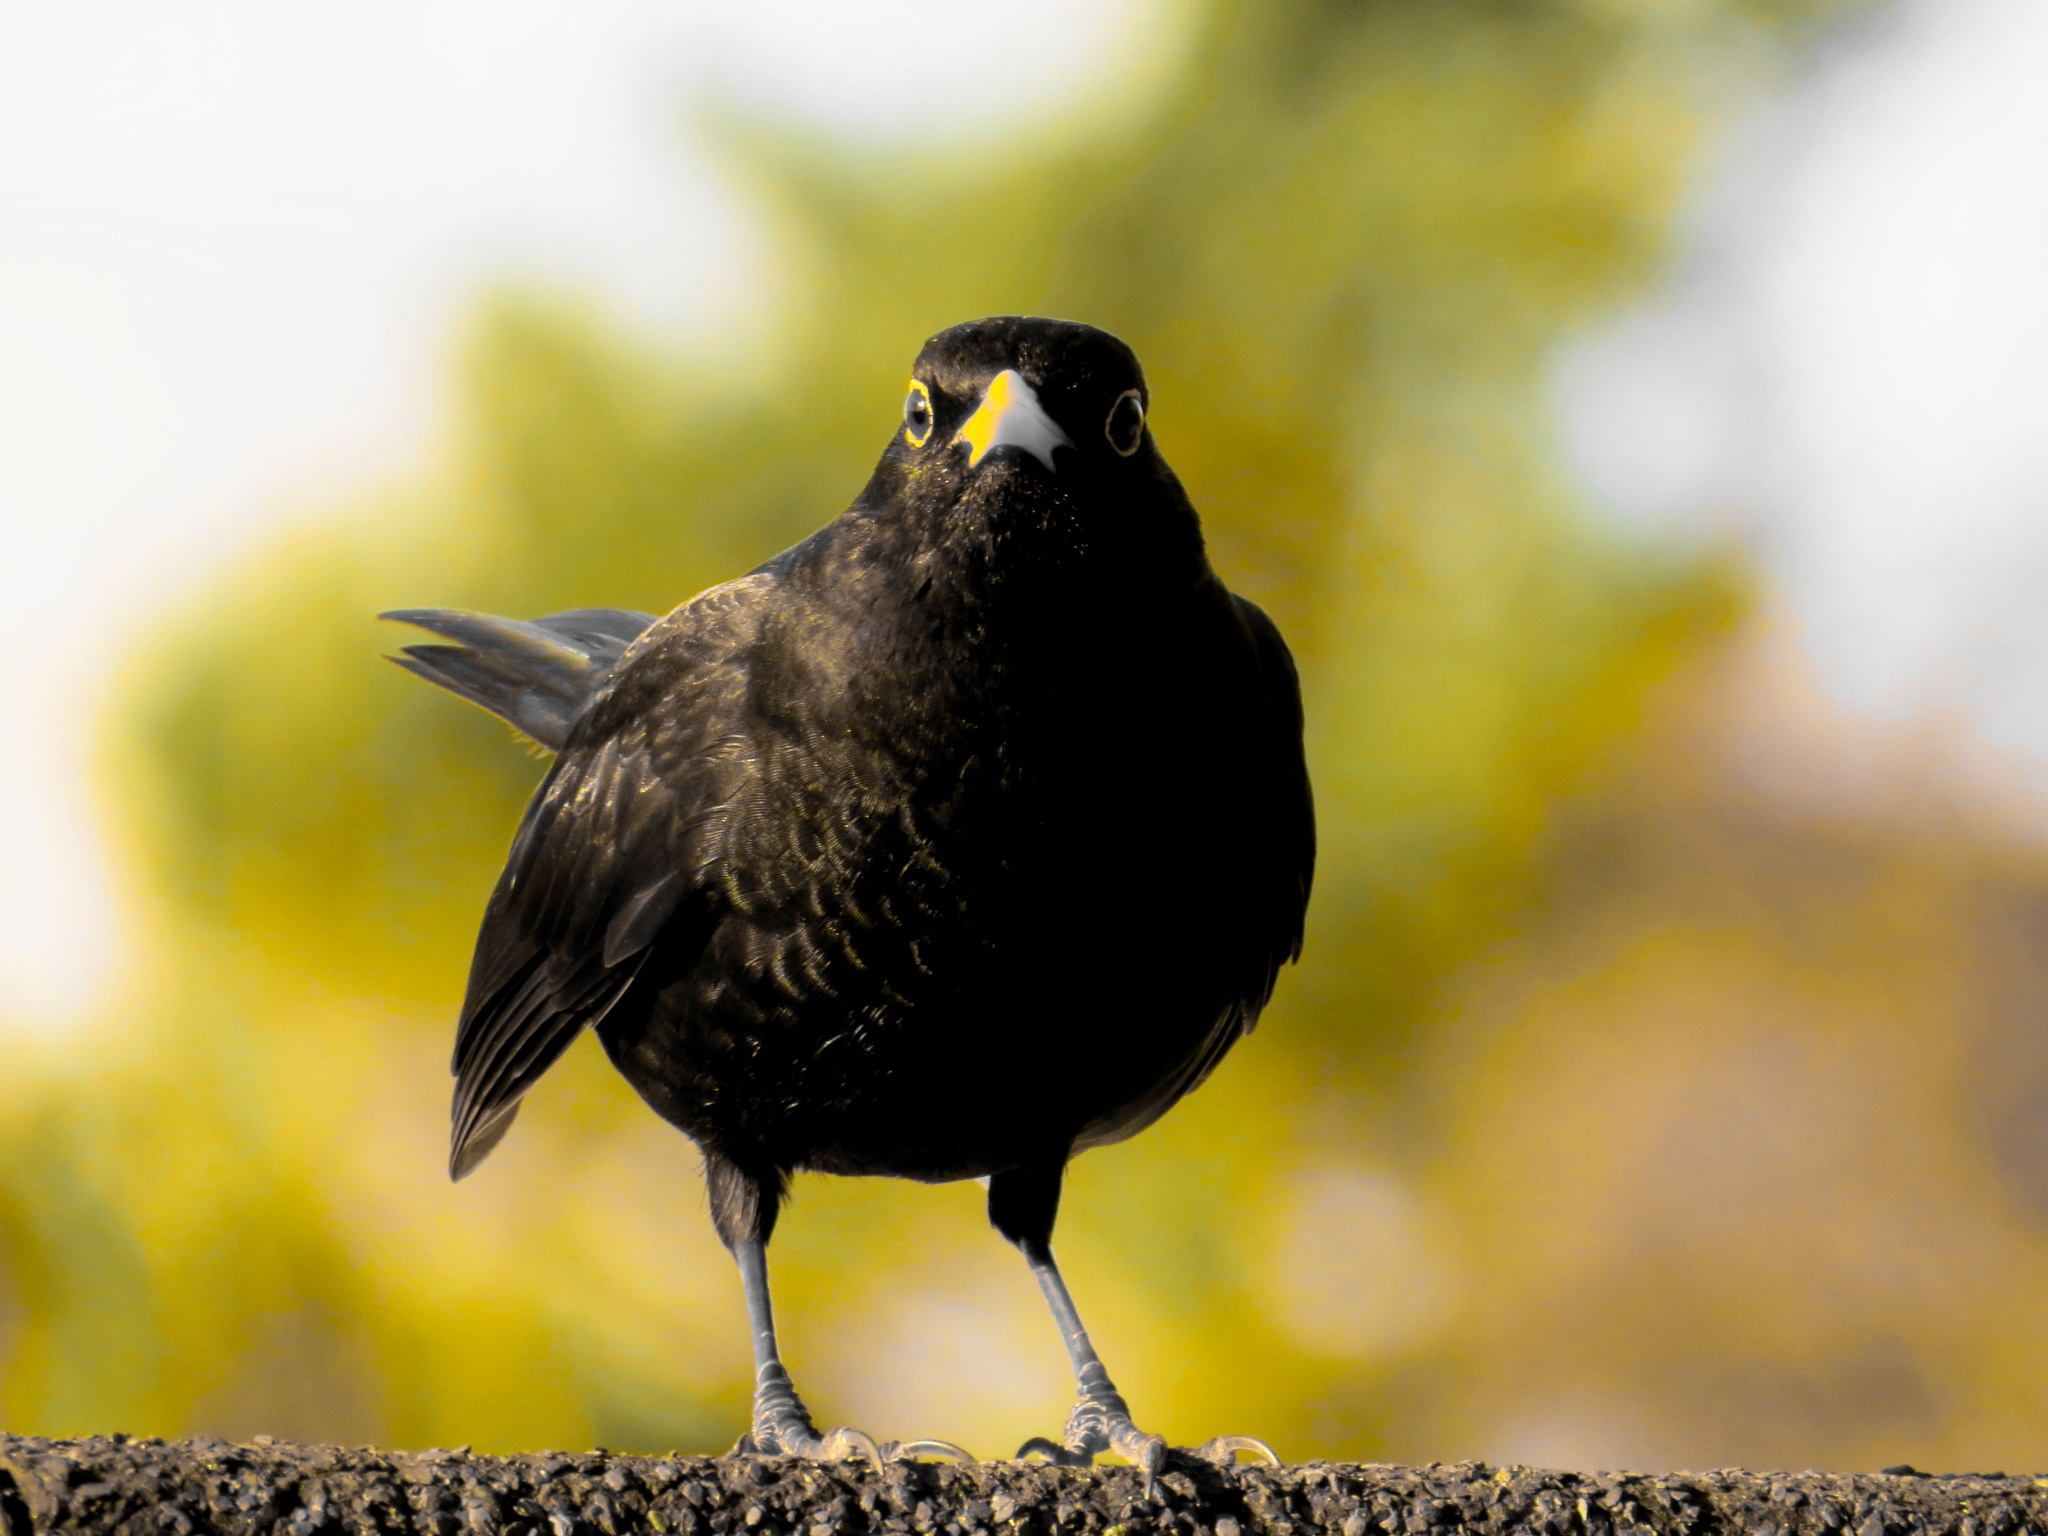 Beautiful Blackbird by June